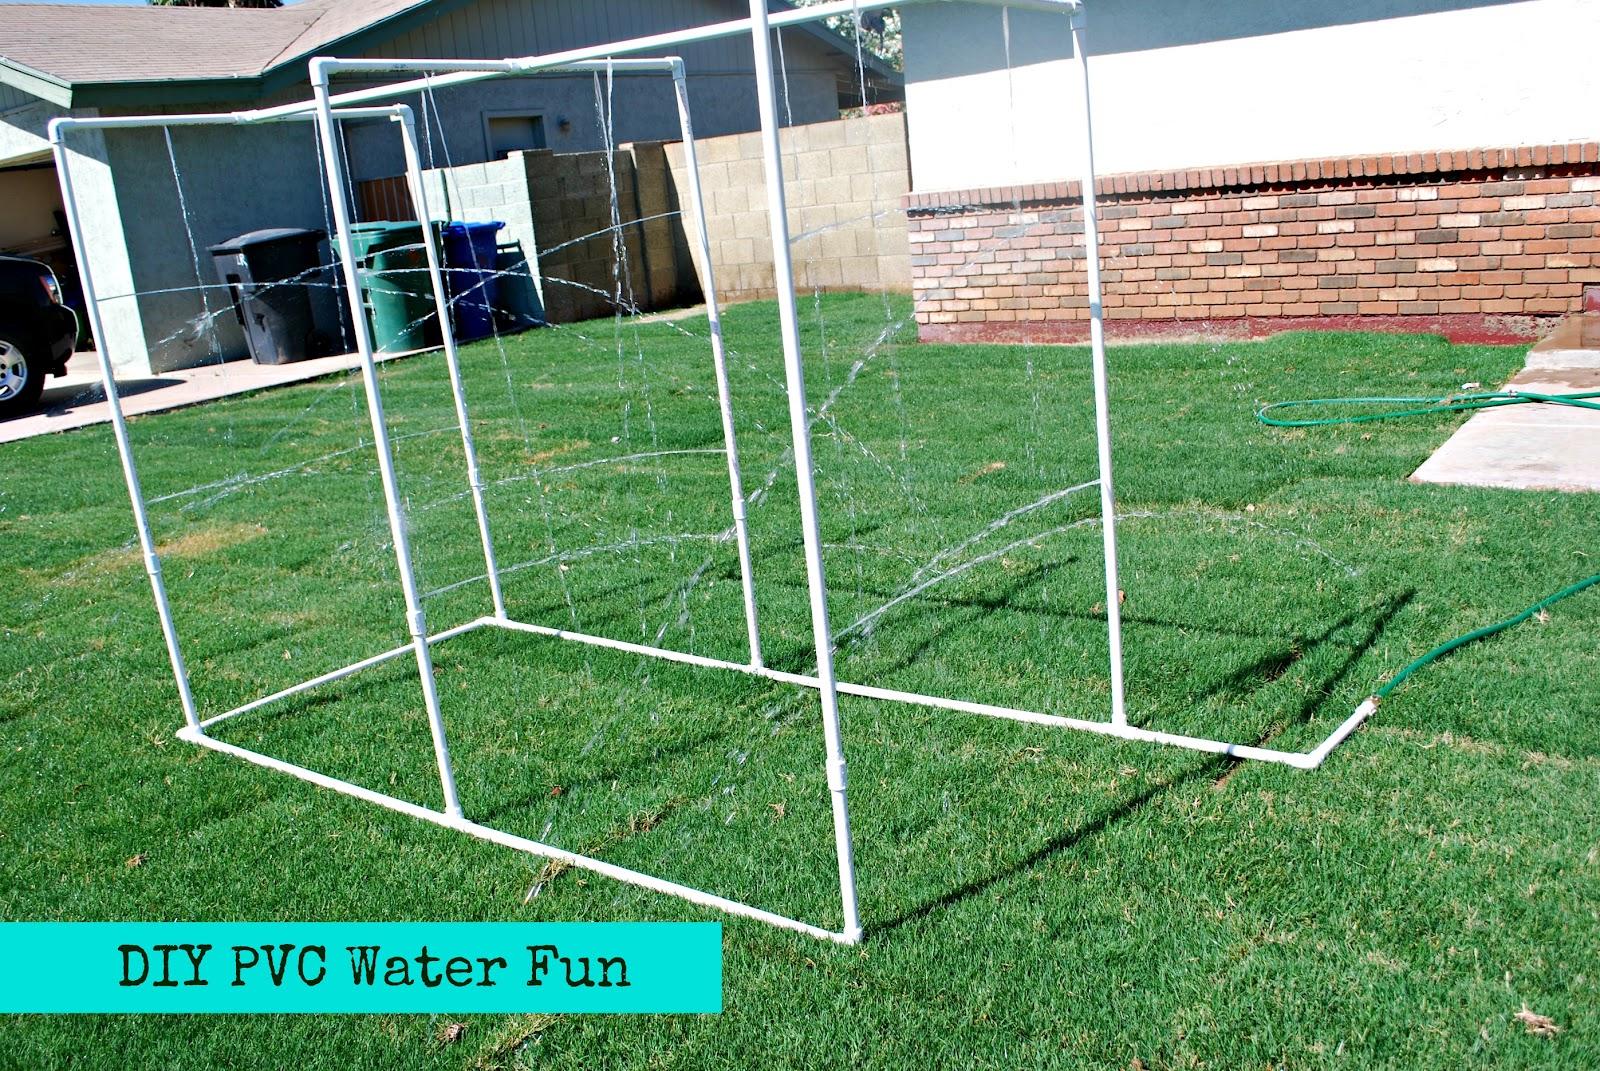 DIY PVC Backyard Water Park - Classy Clutter